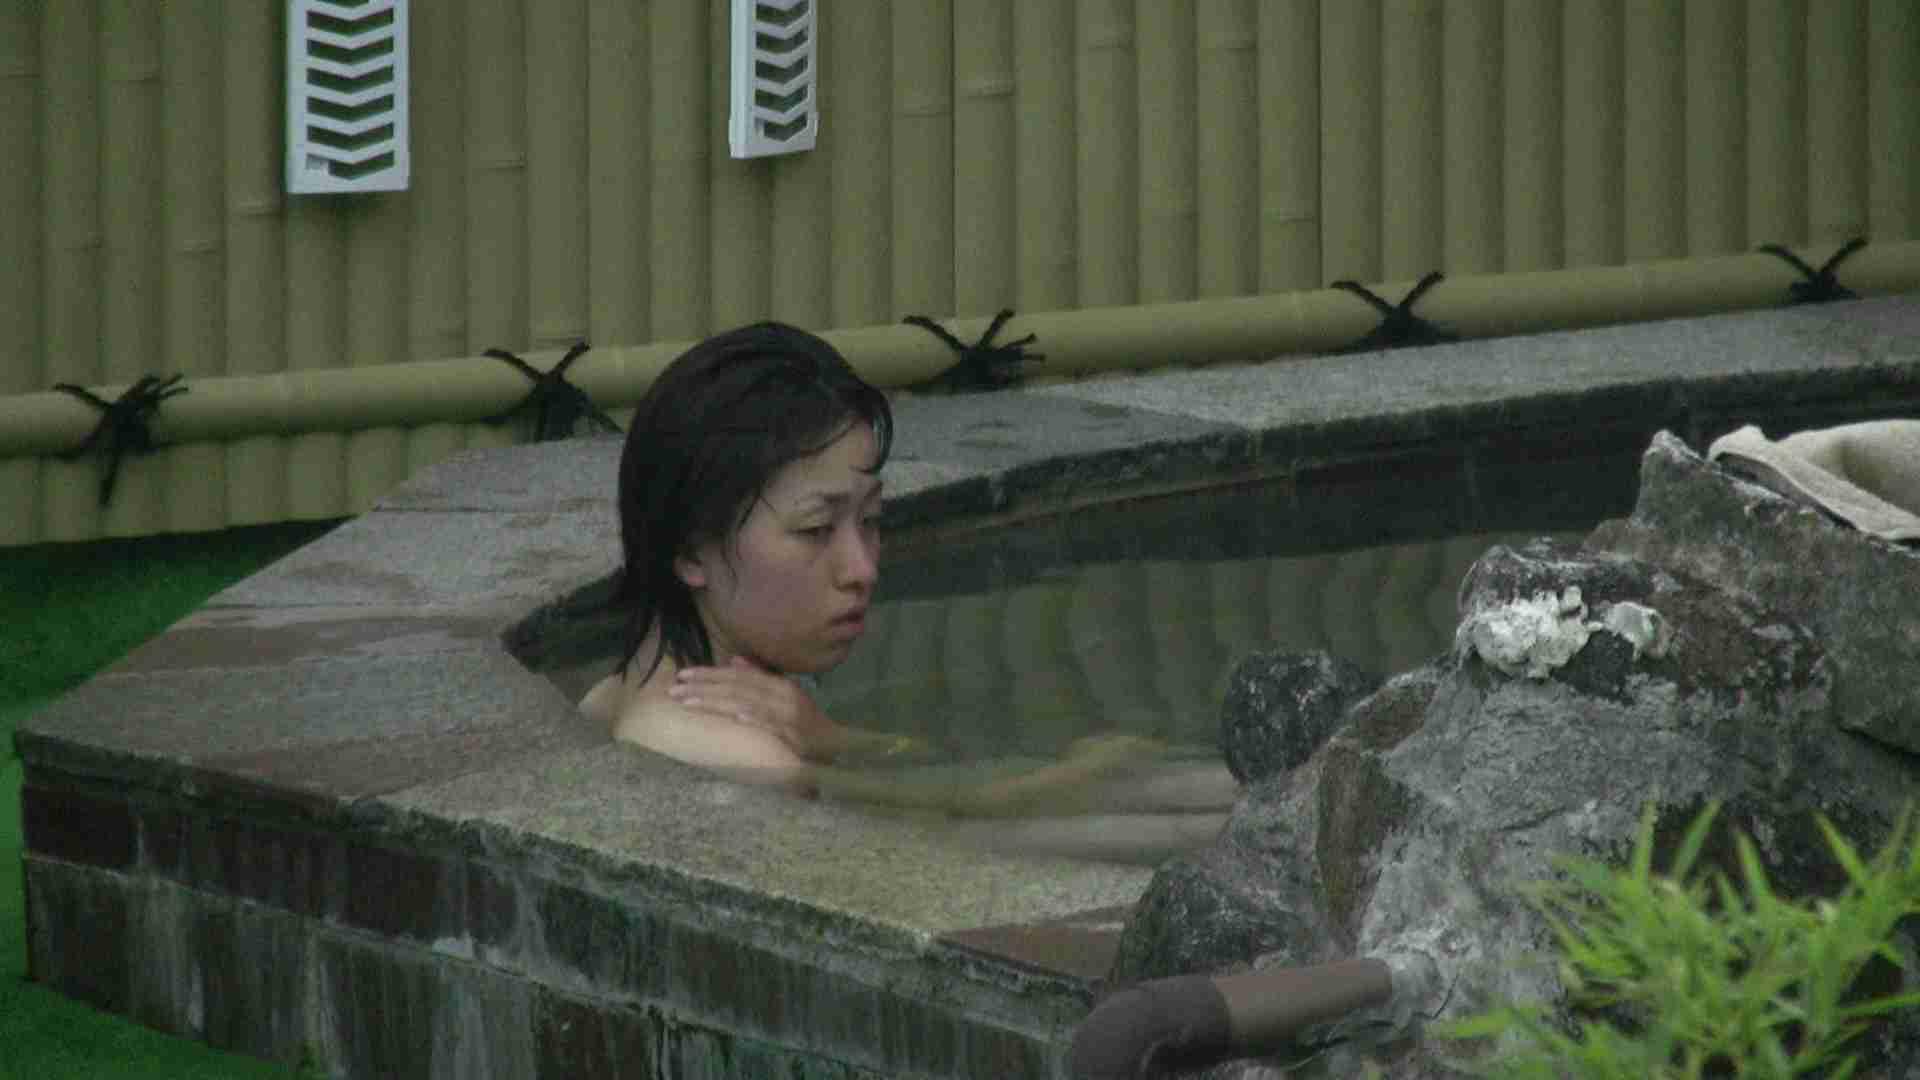 Aquaな露天風呂Vol.170 0  65連発 12